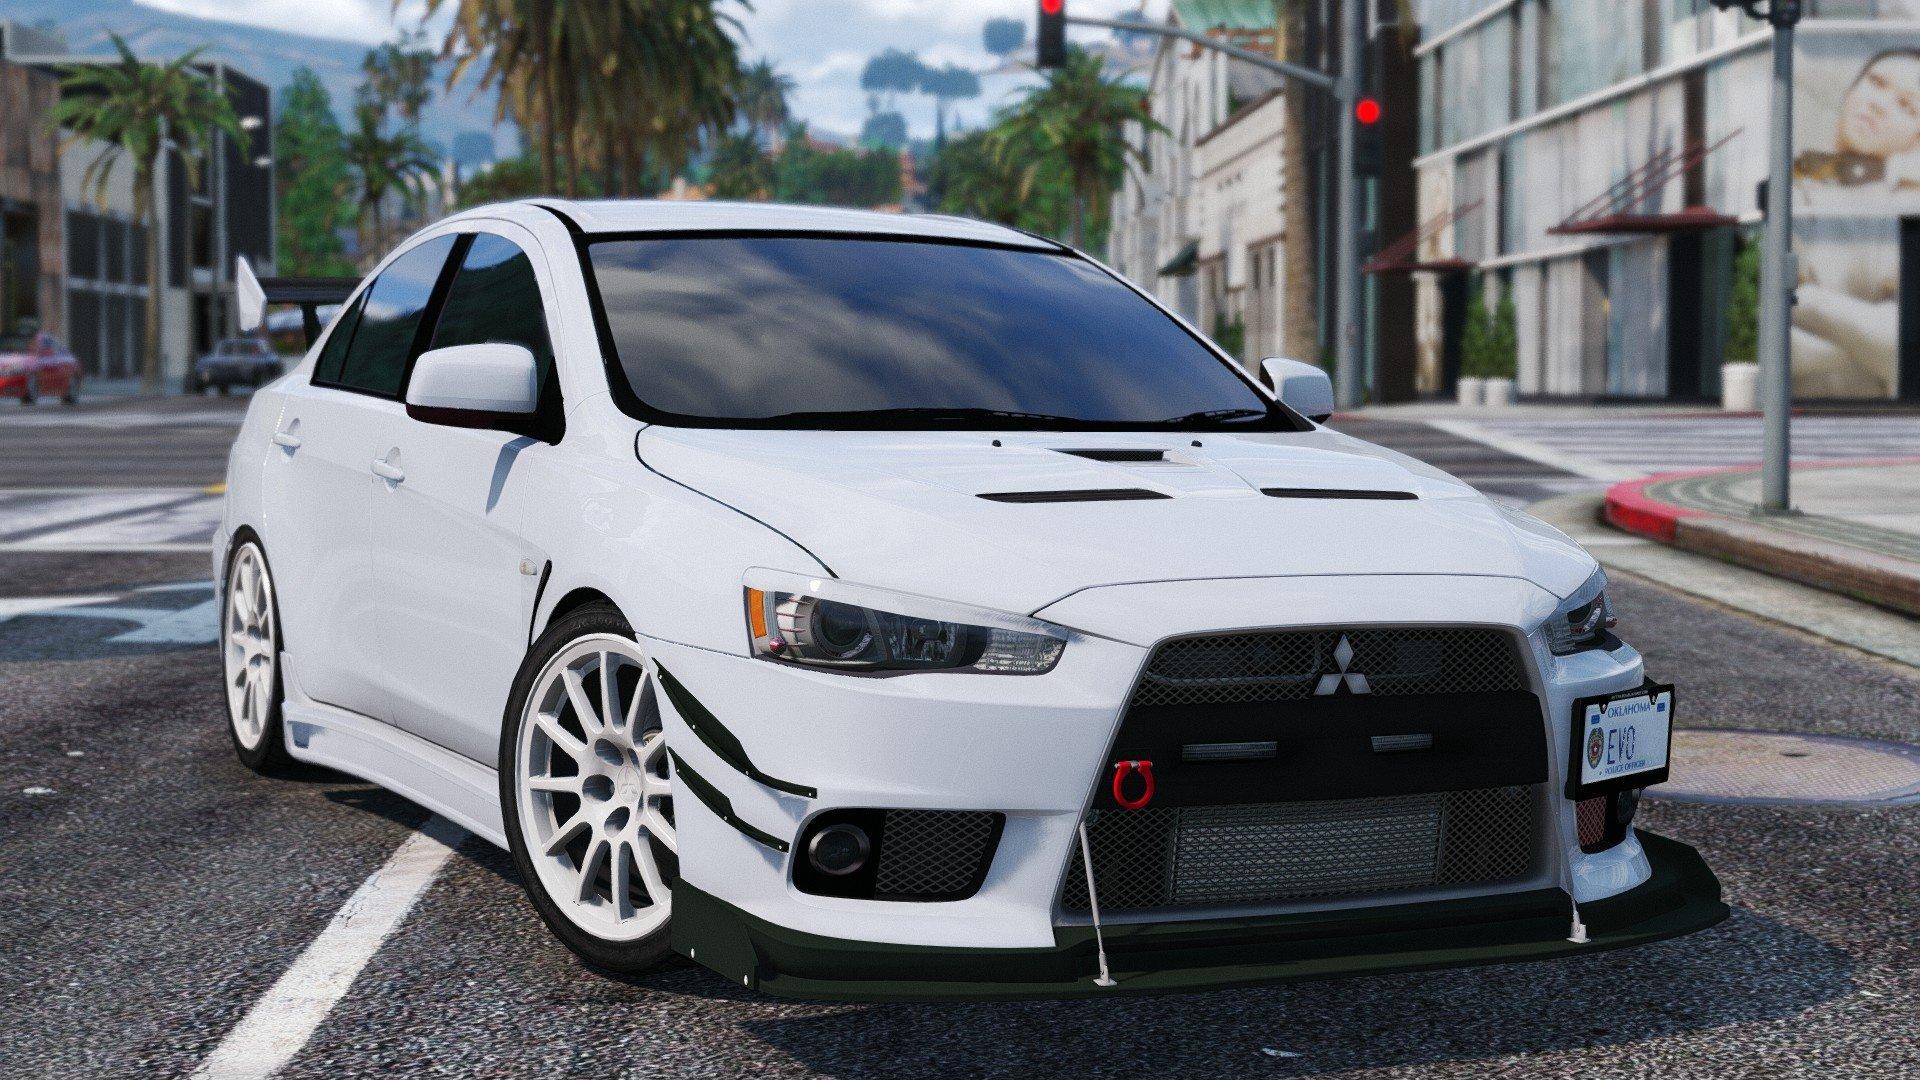 Mitsubishi Lancer Evolution Wallpapers Vehicles Hq